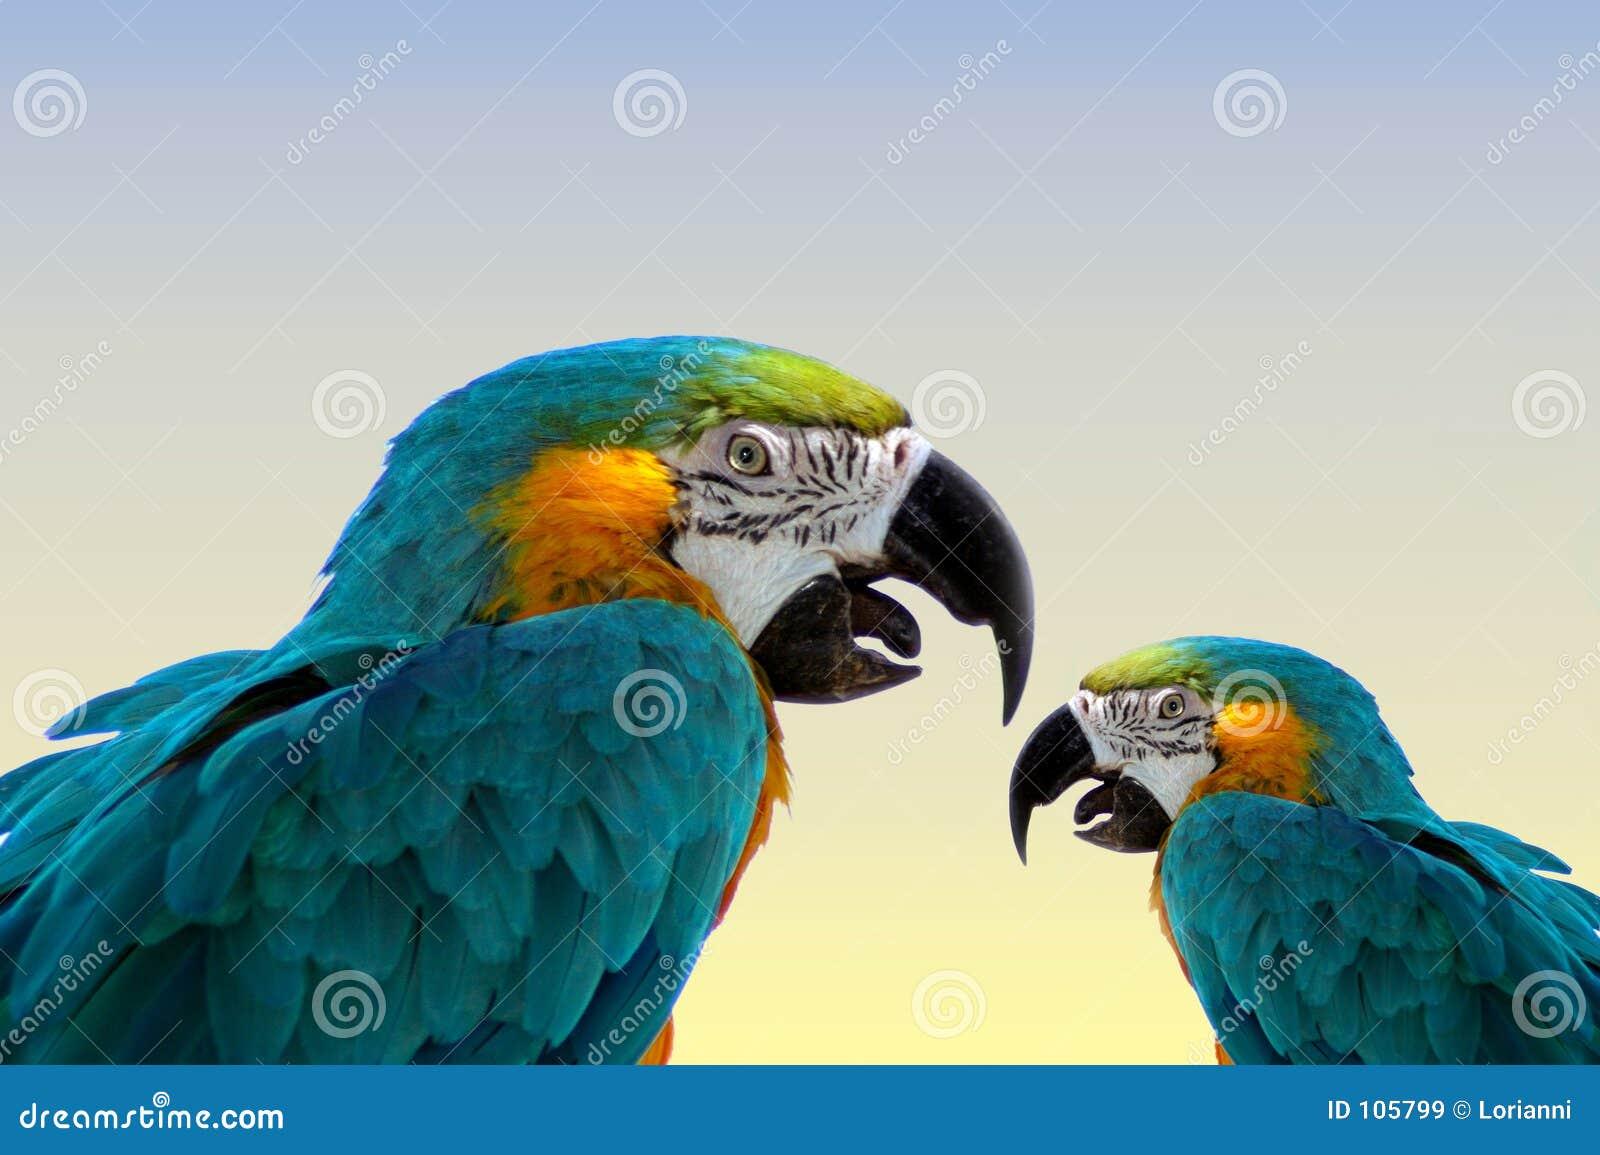 Macaw parrots такие же